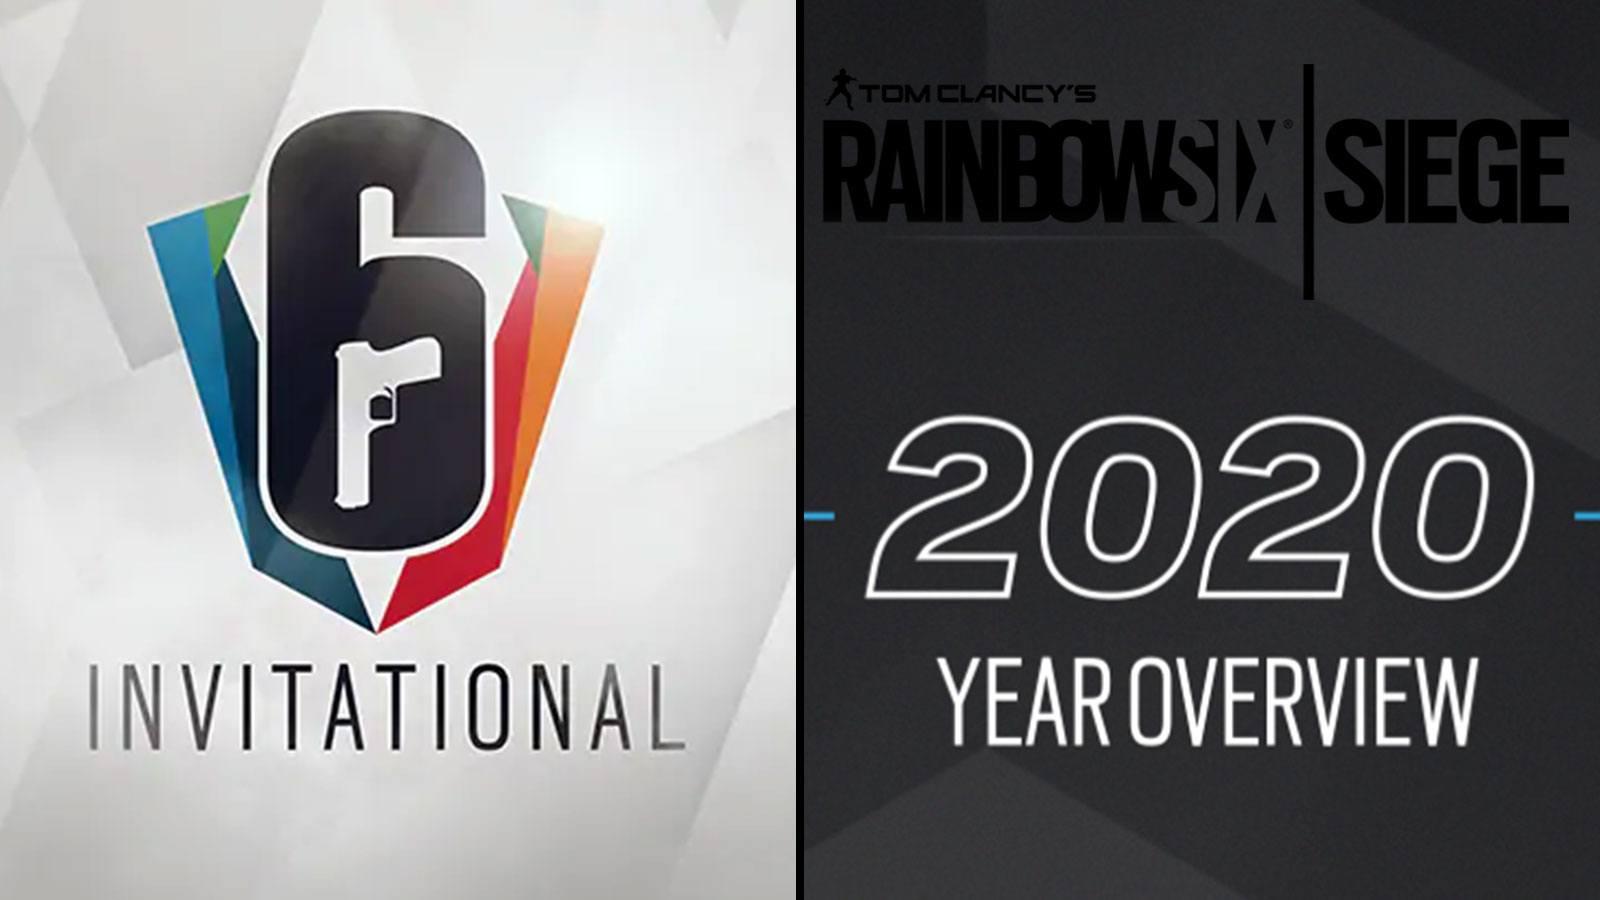 Rainbow Six Siege scène e-sport 2020 ubisoft